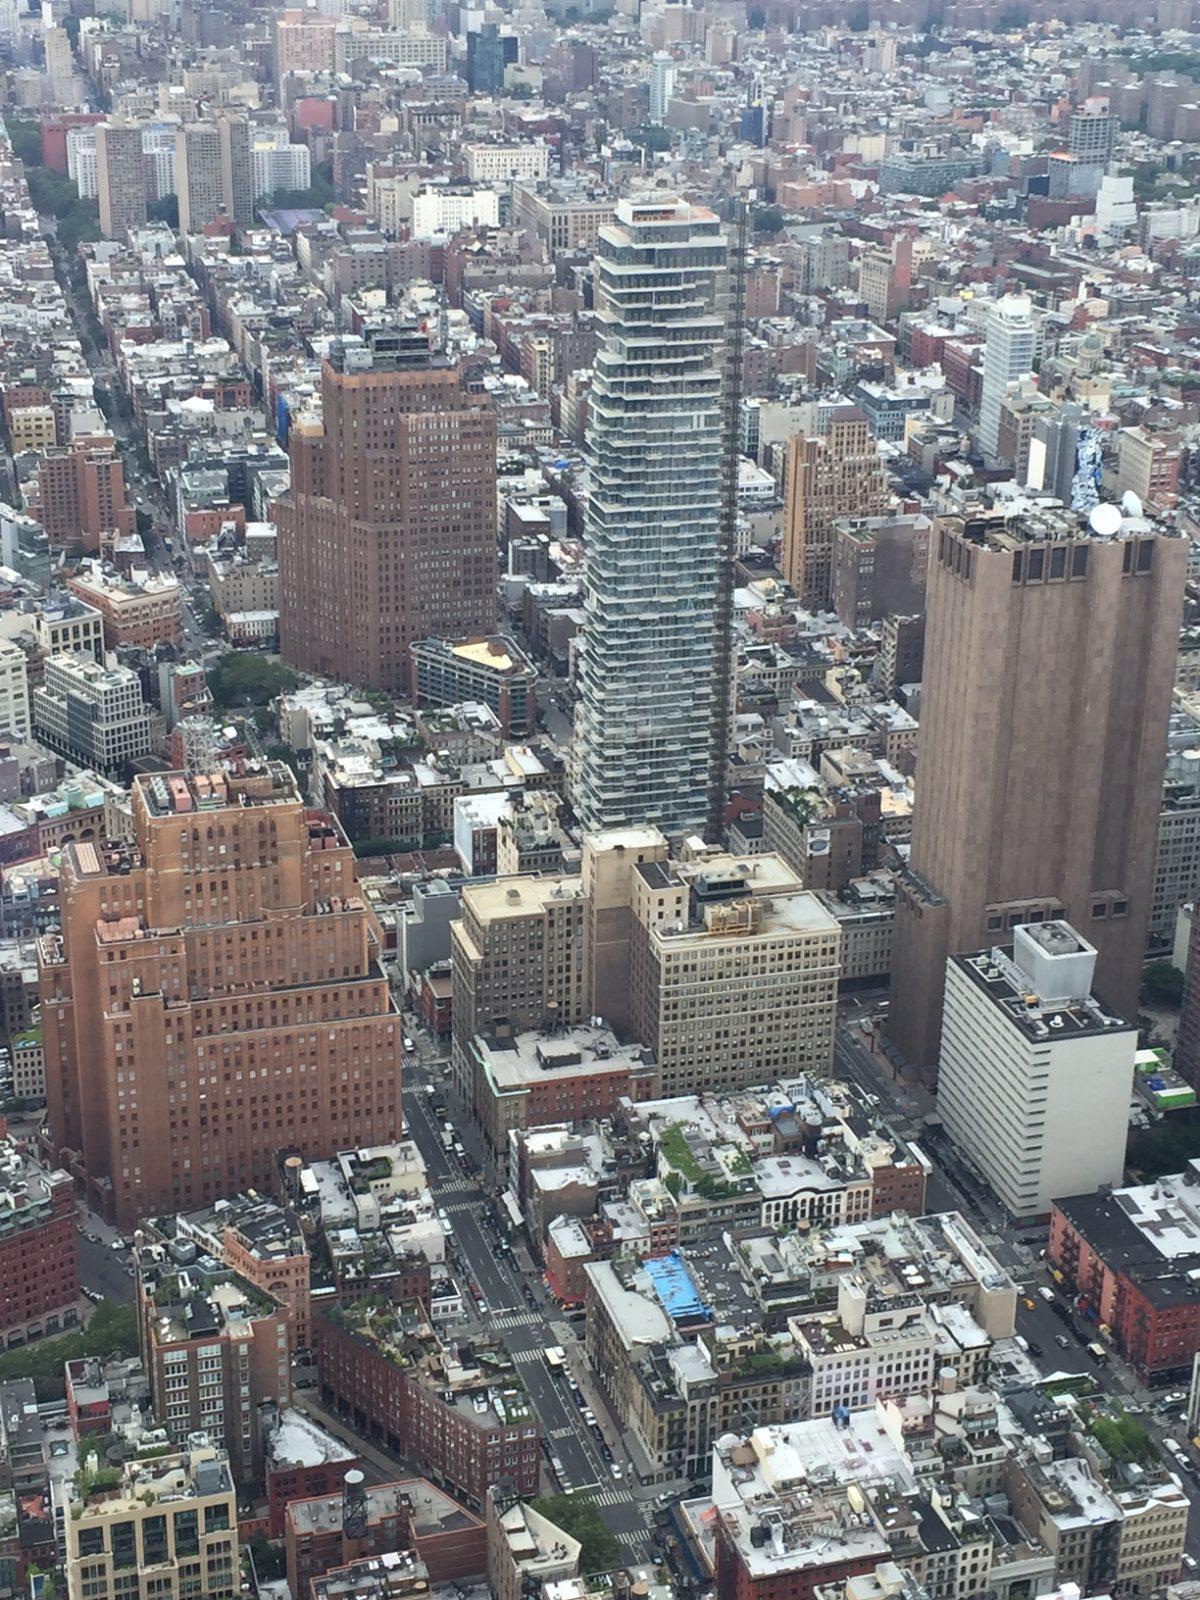 The Grid of Manhattan